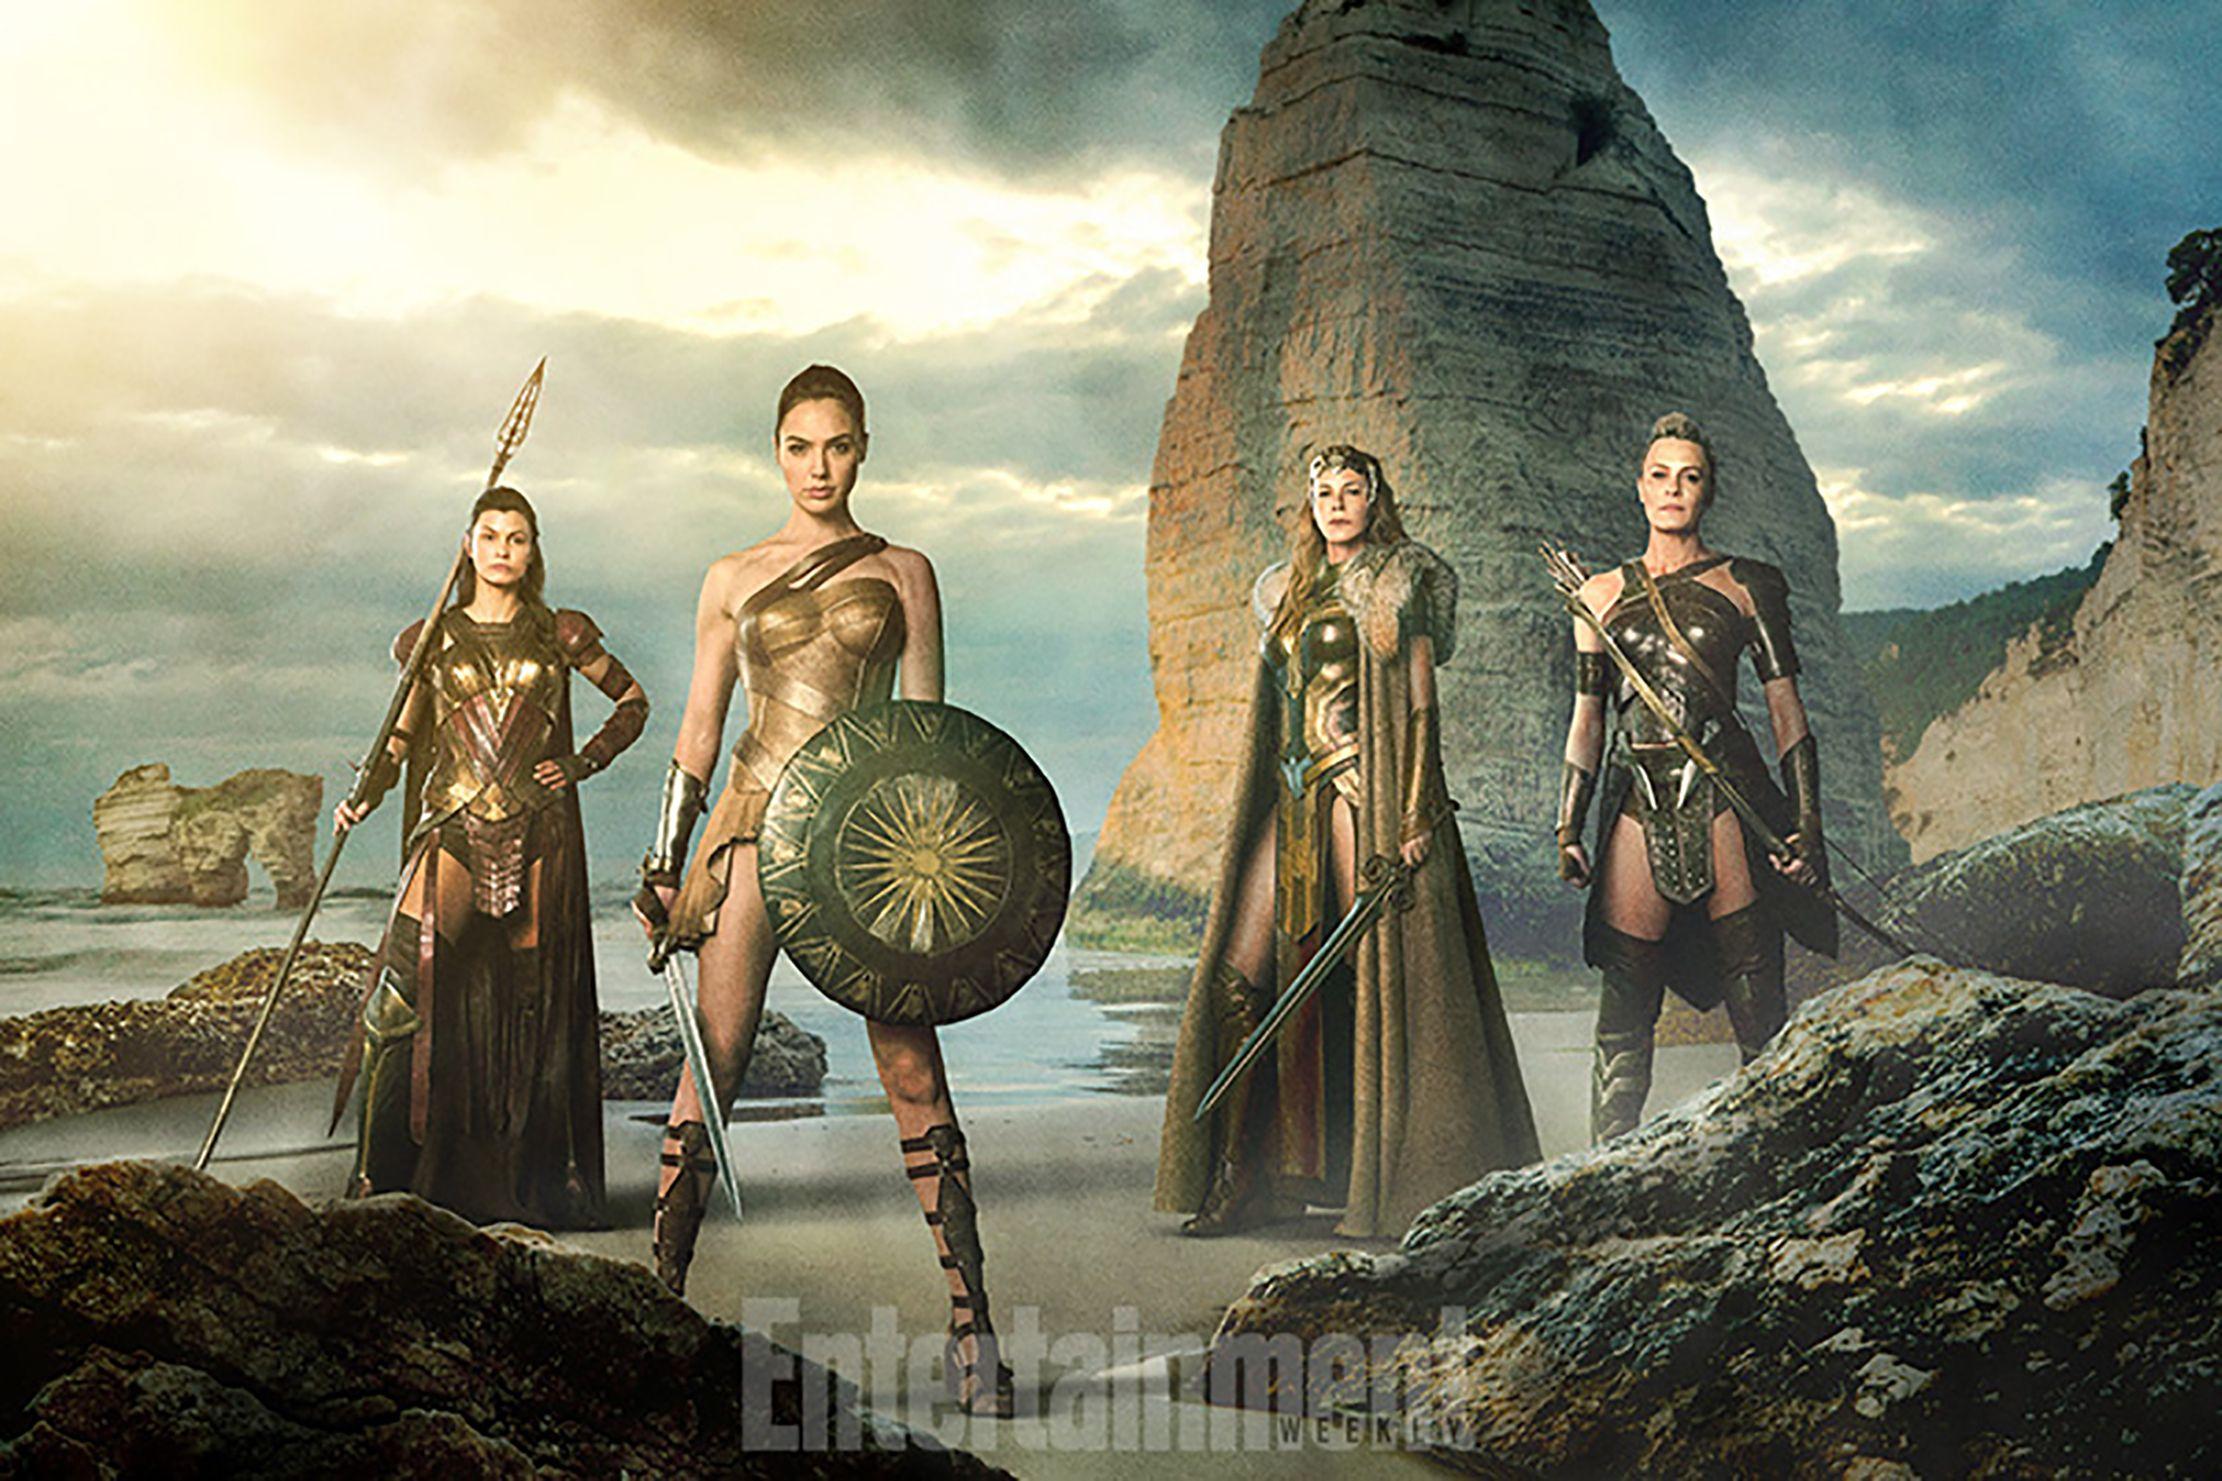 Pin By Andrea Kirkendall On New Moon Gal Gadot Wonder Woman Wonder Woman Movie Wonder Woman